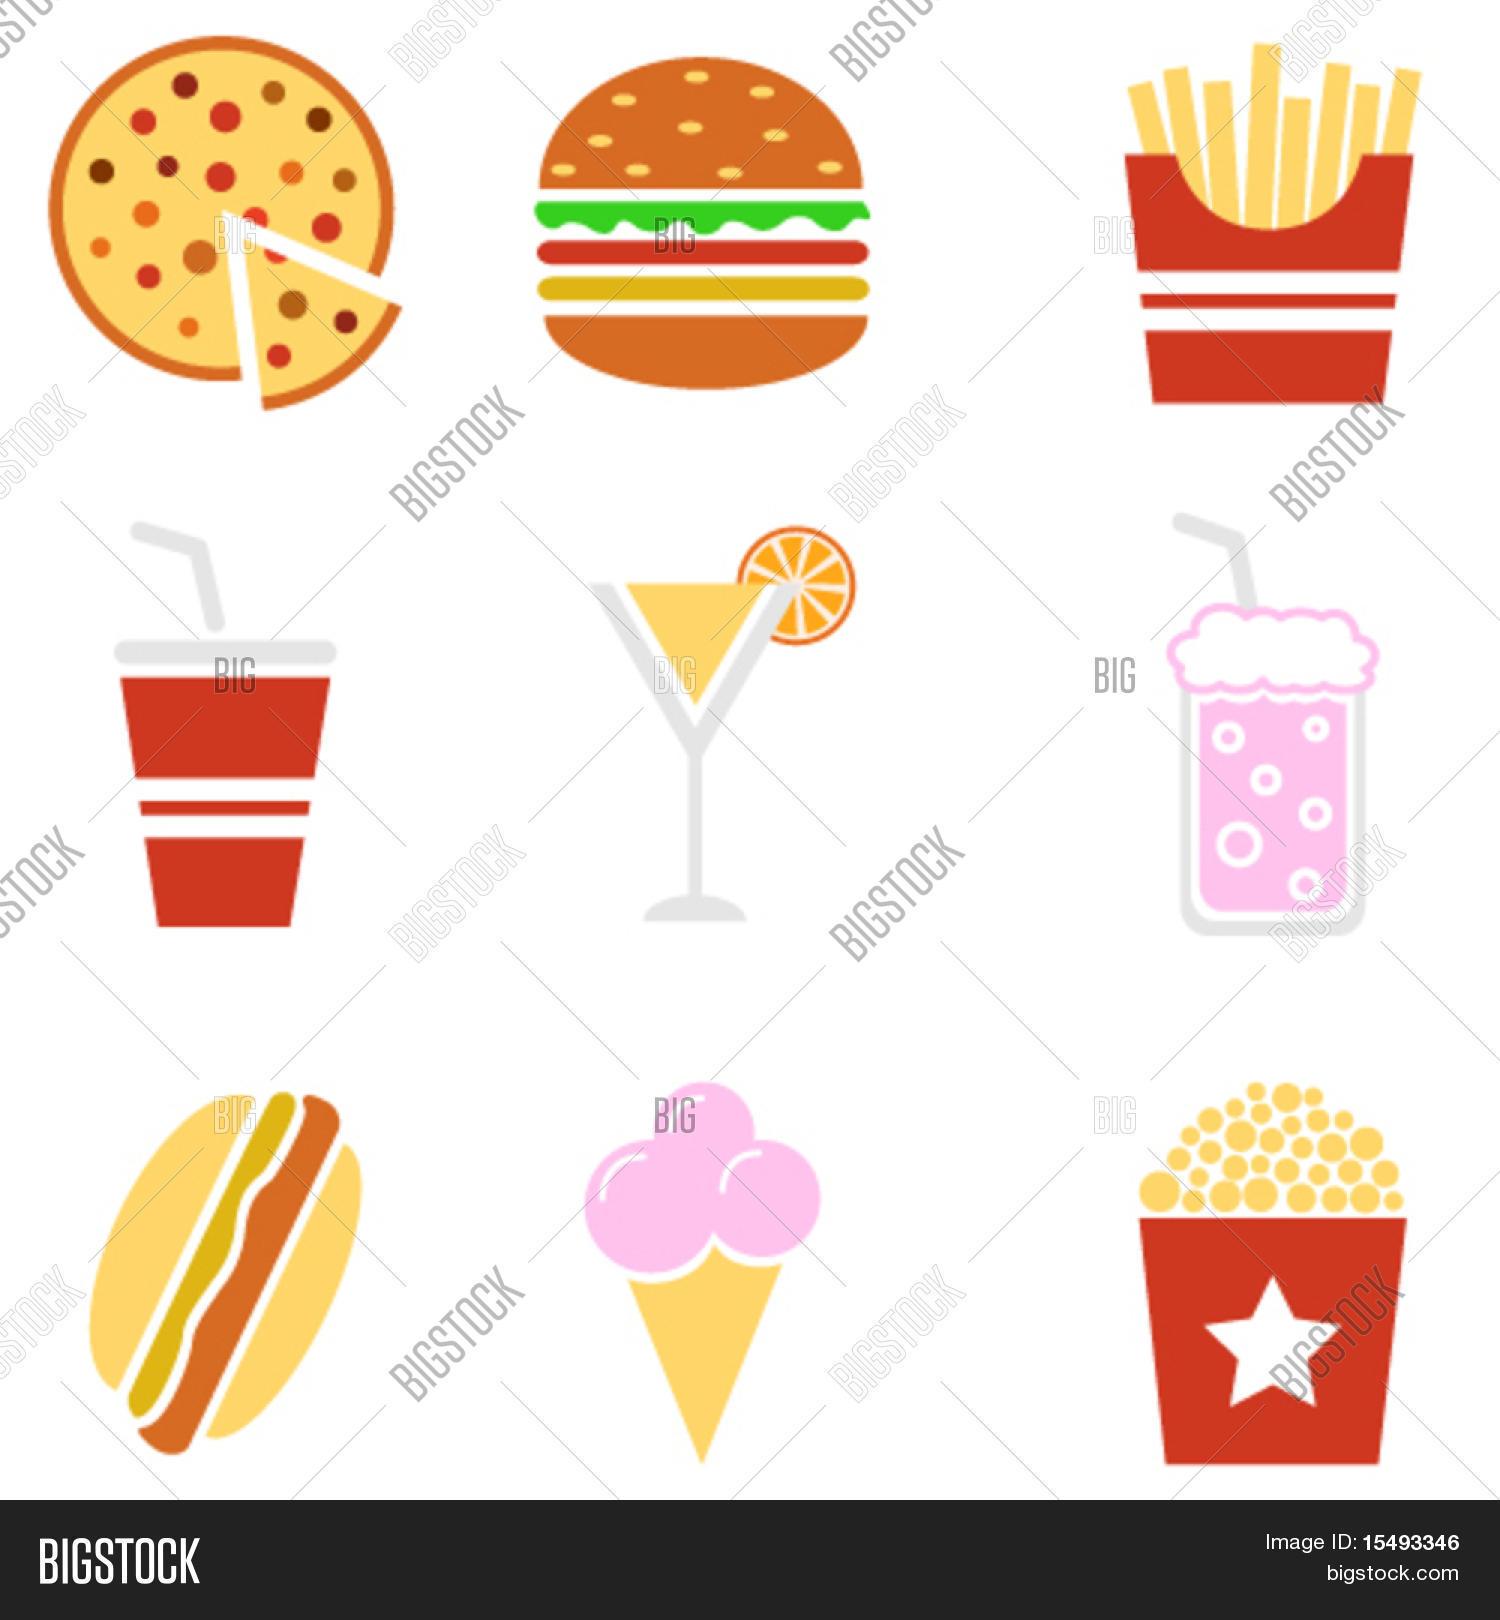 Fast Food Symbols Vector Photo Free Trial Bigstock